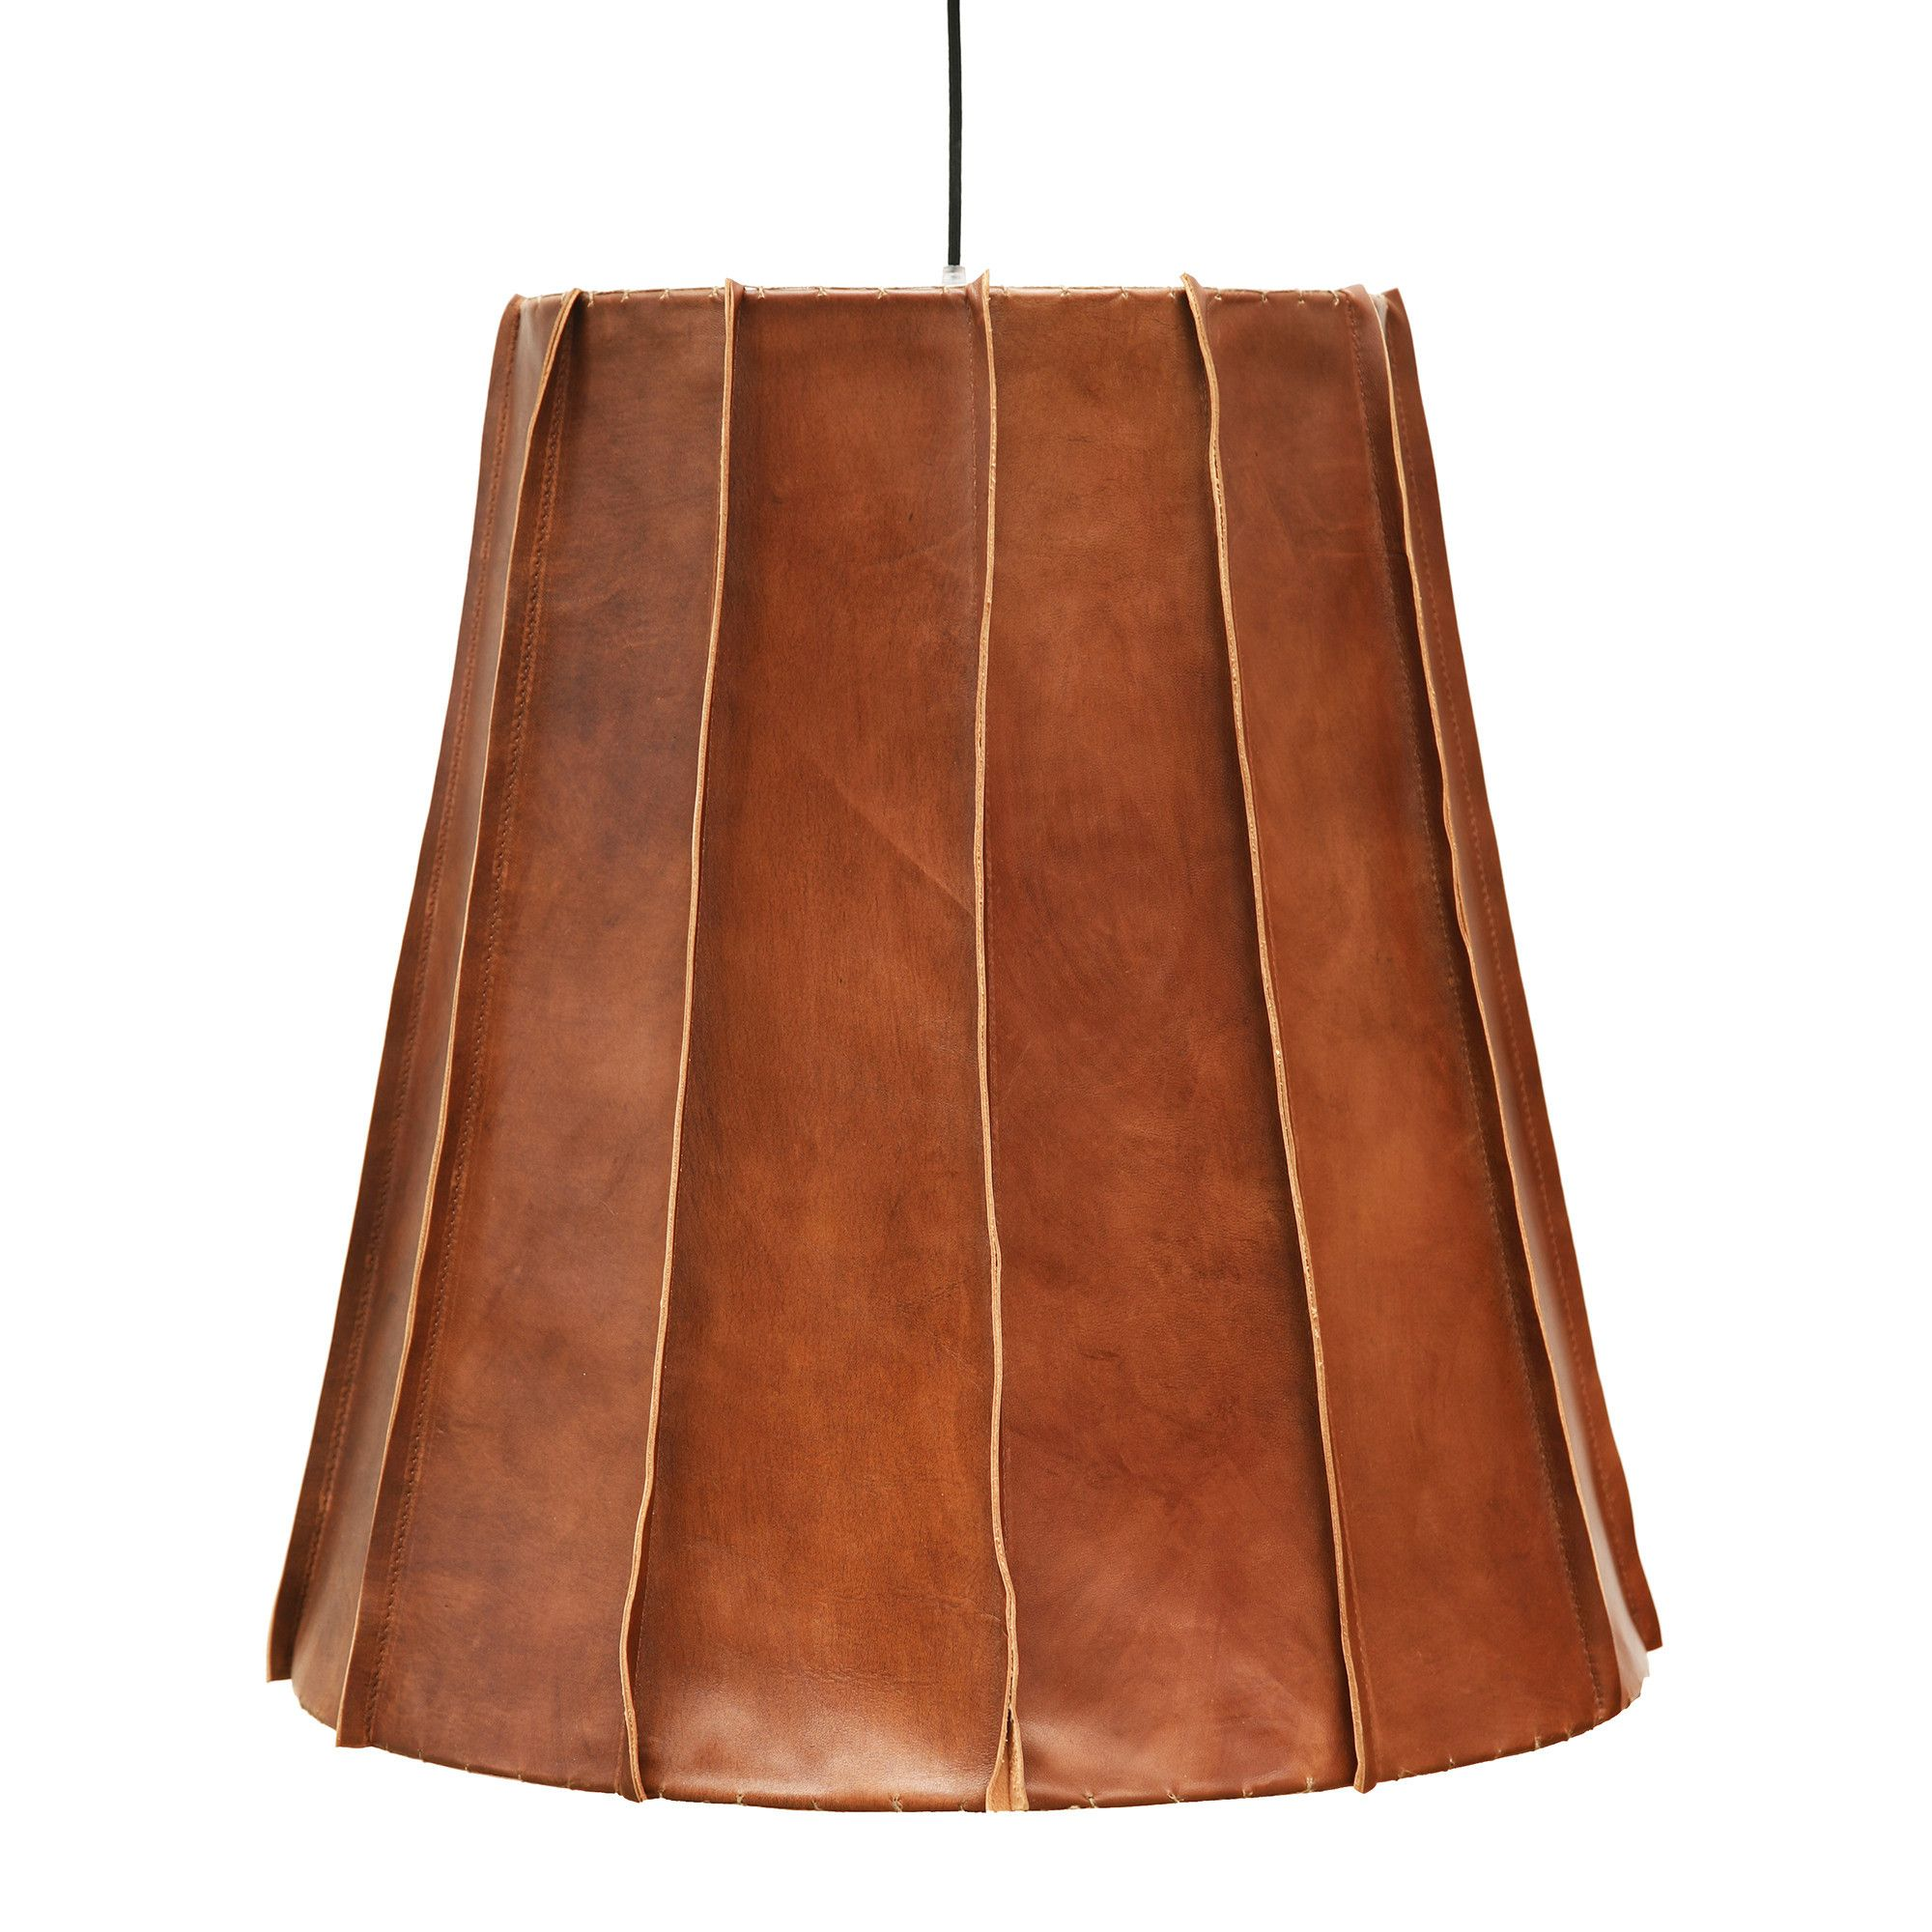 Leather Lamp Leather Decor Leather Diy Leather Rug